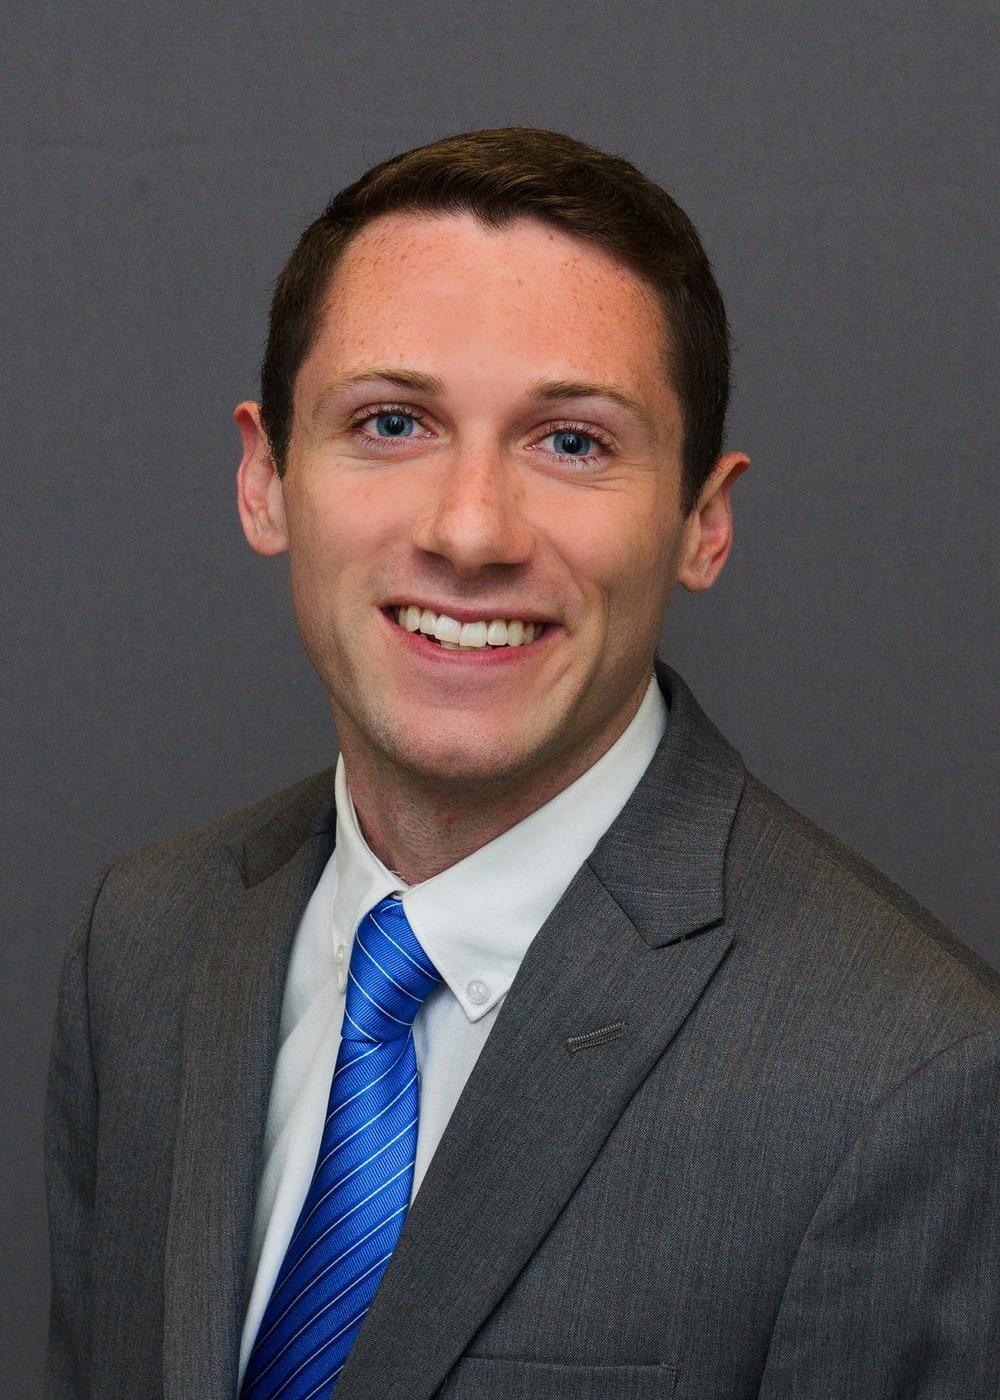 Matthew R. Powell